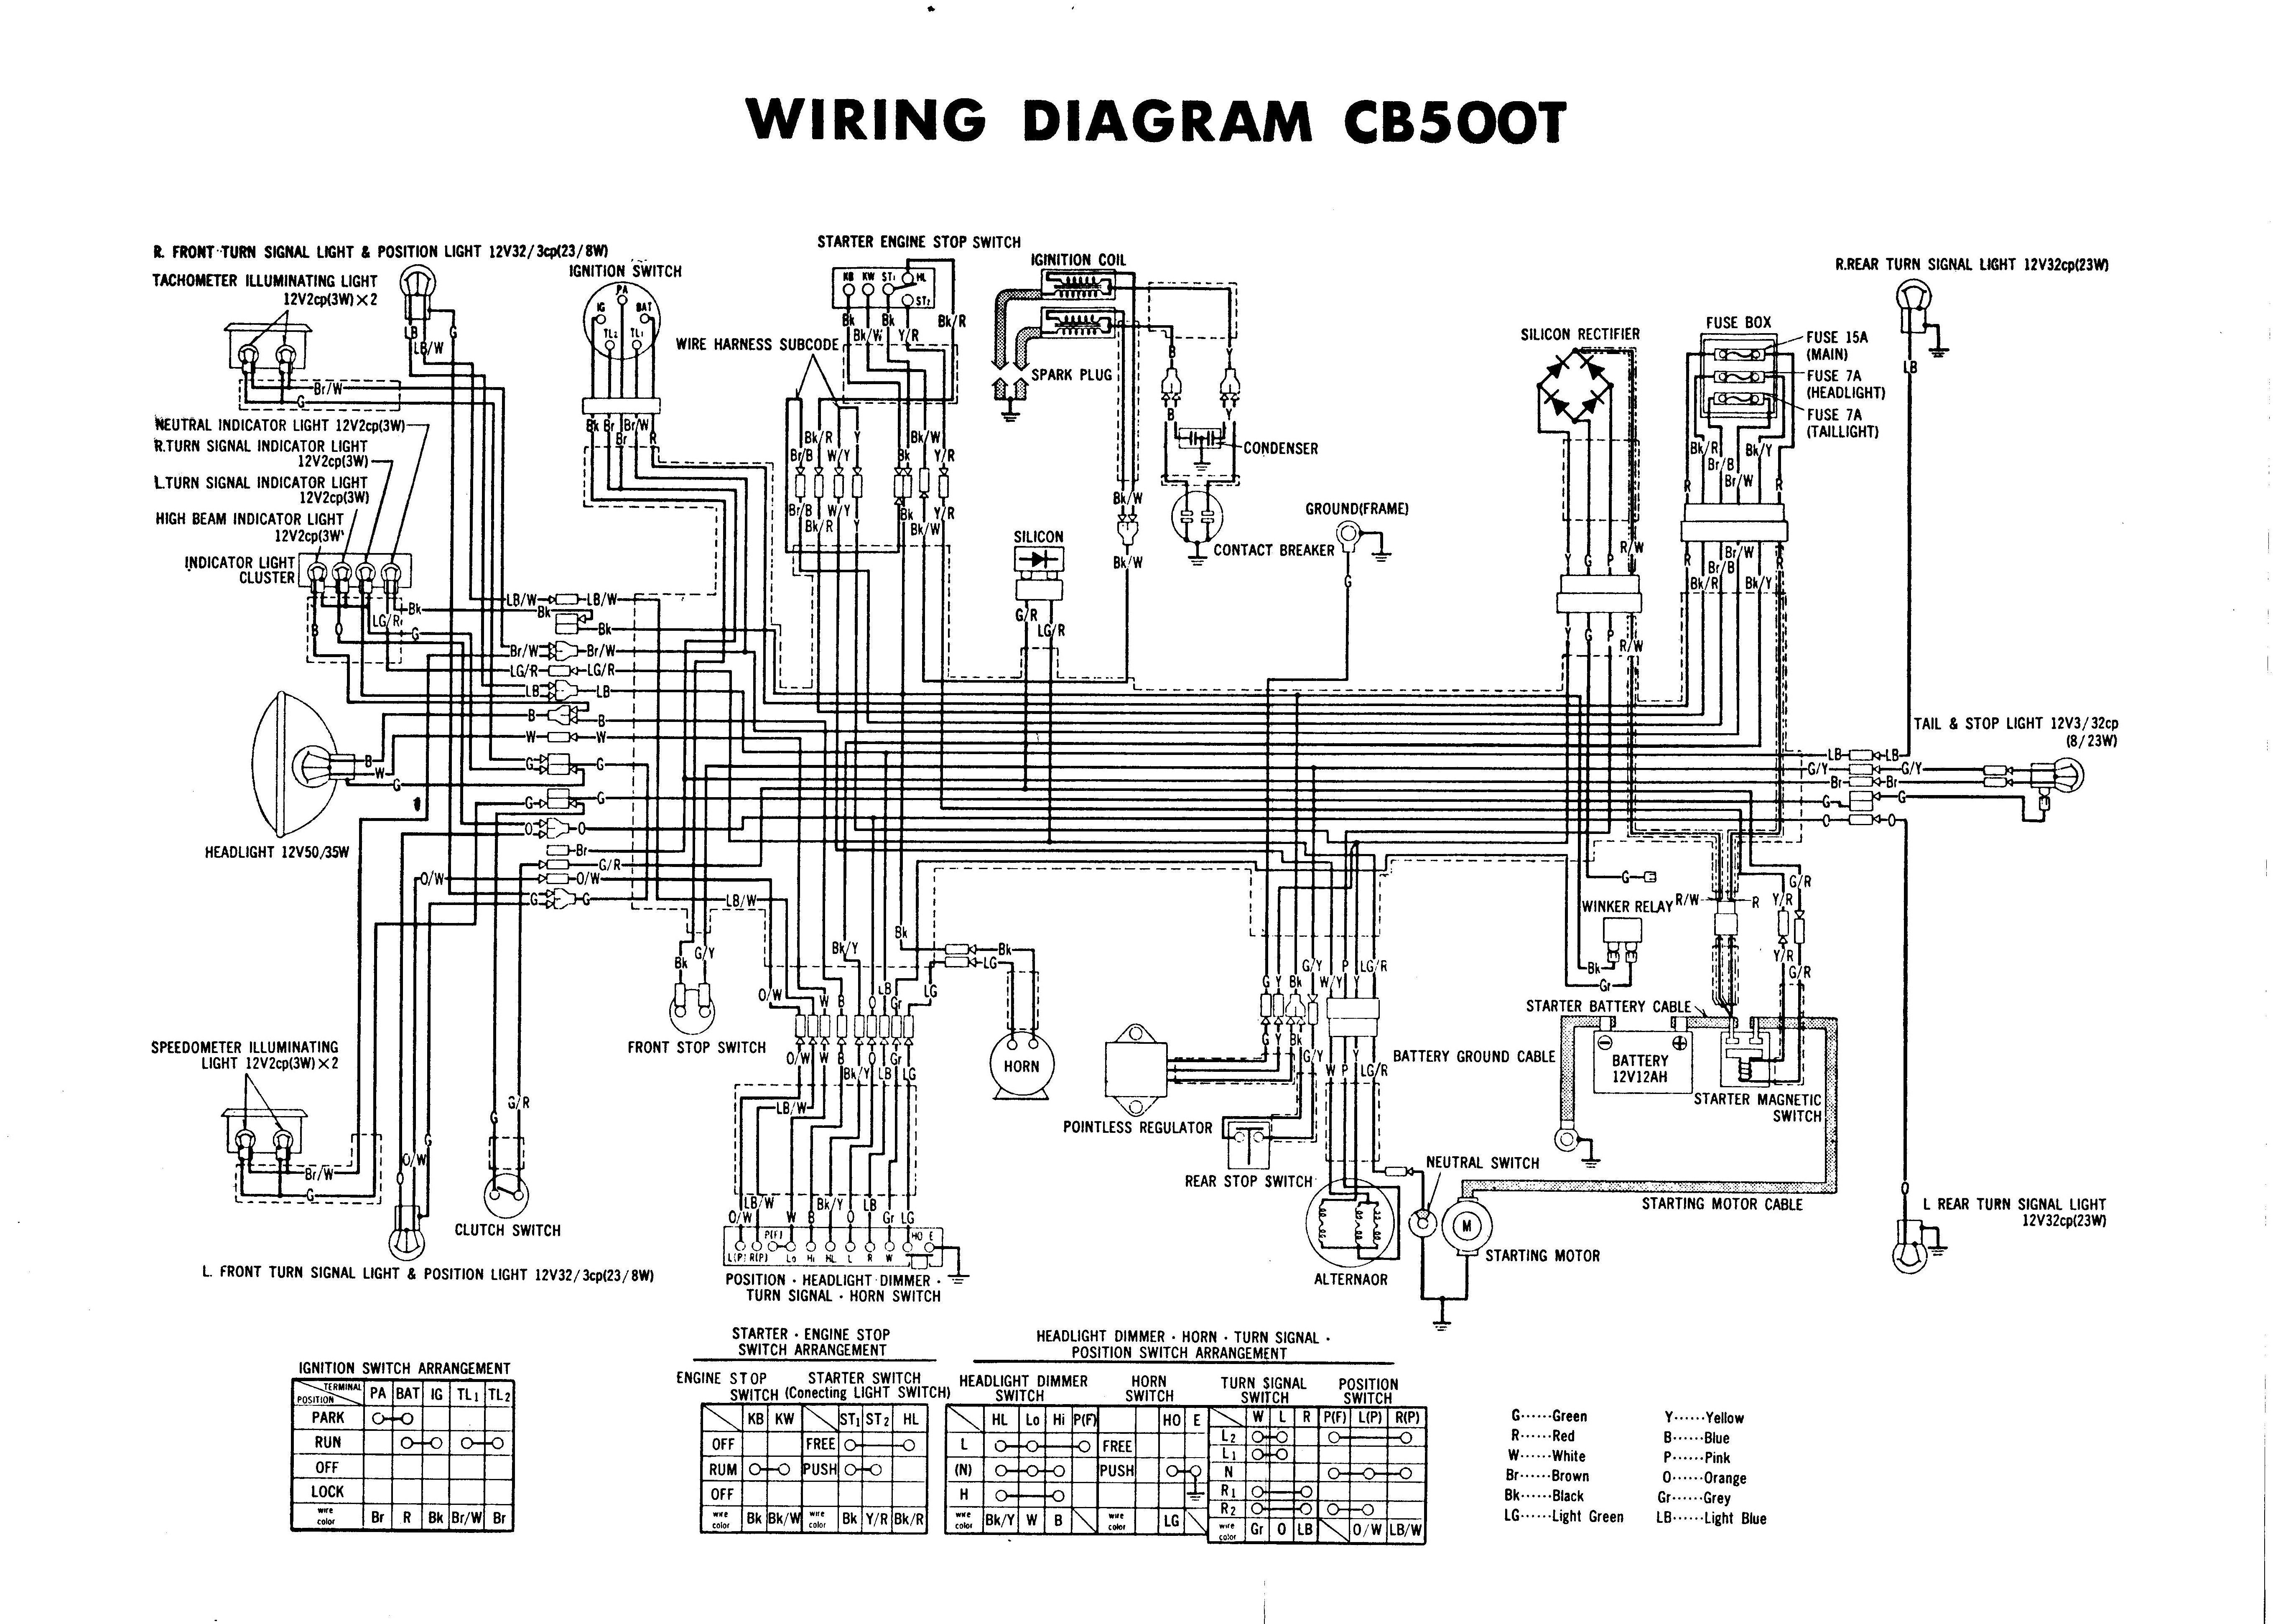 cb500t wiring diagram wiring diagram world honda cb500t wiring diagram cb500t wiring diagram wiring diagram expert [ 5438 x 3885 Pixel ]